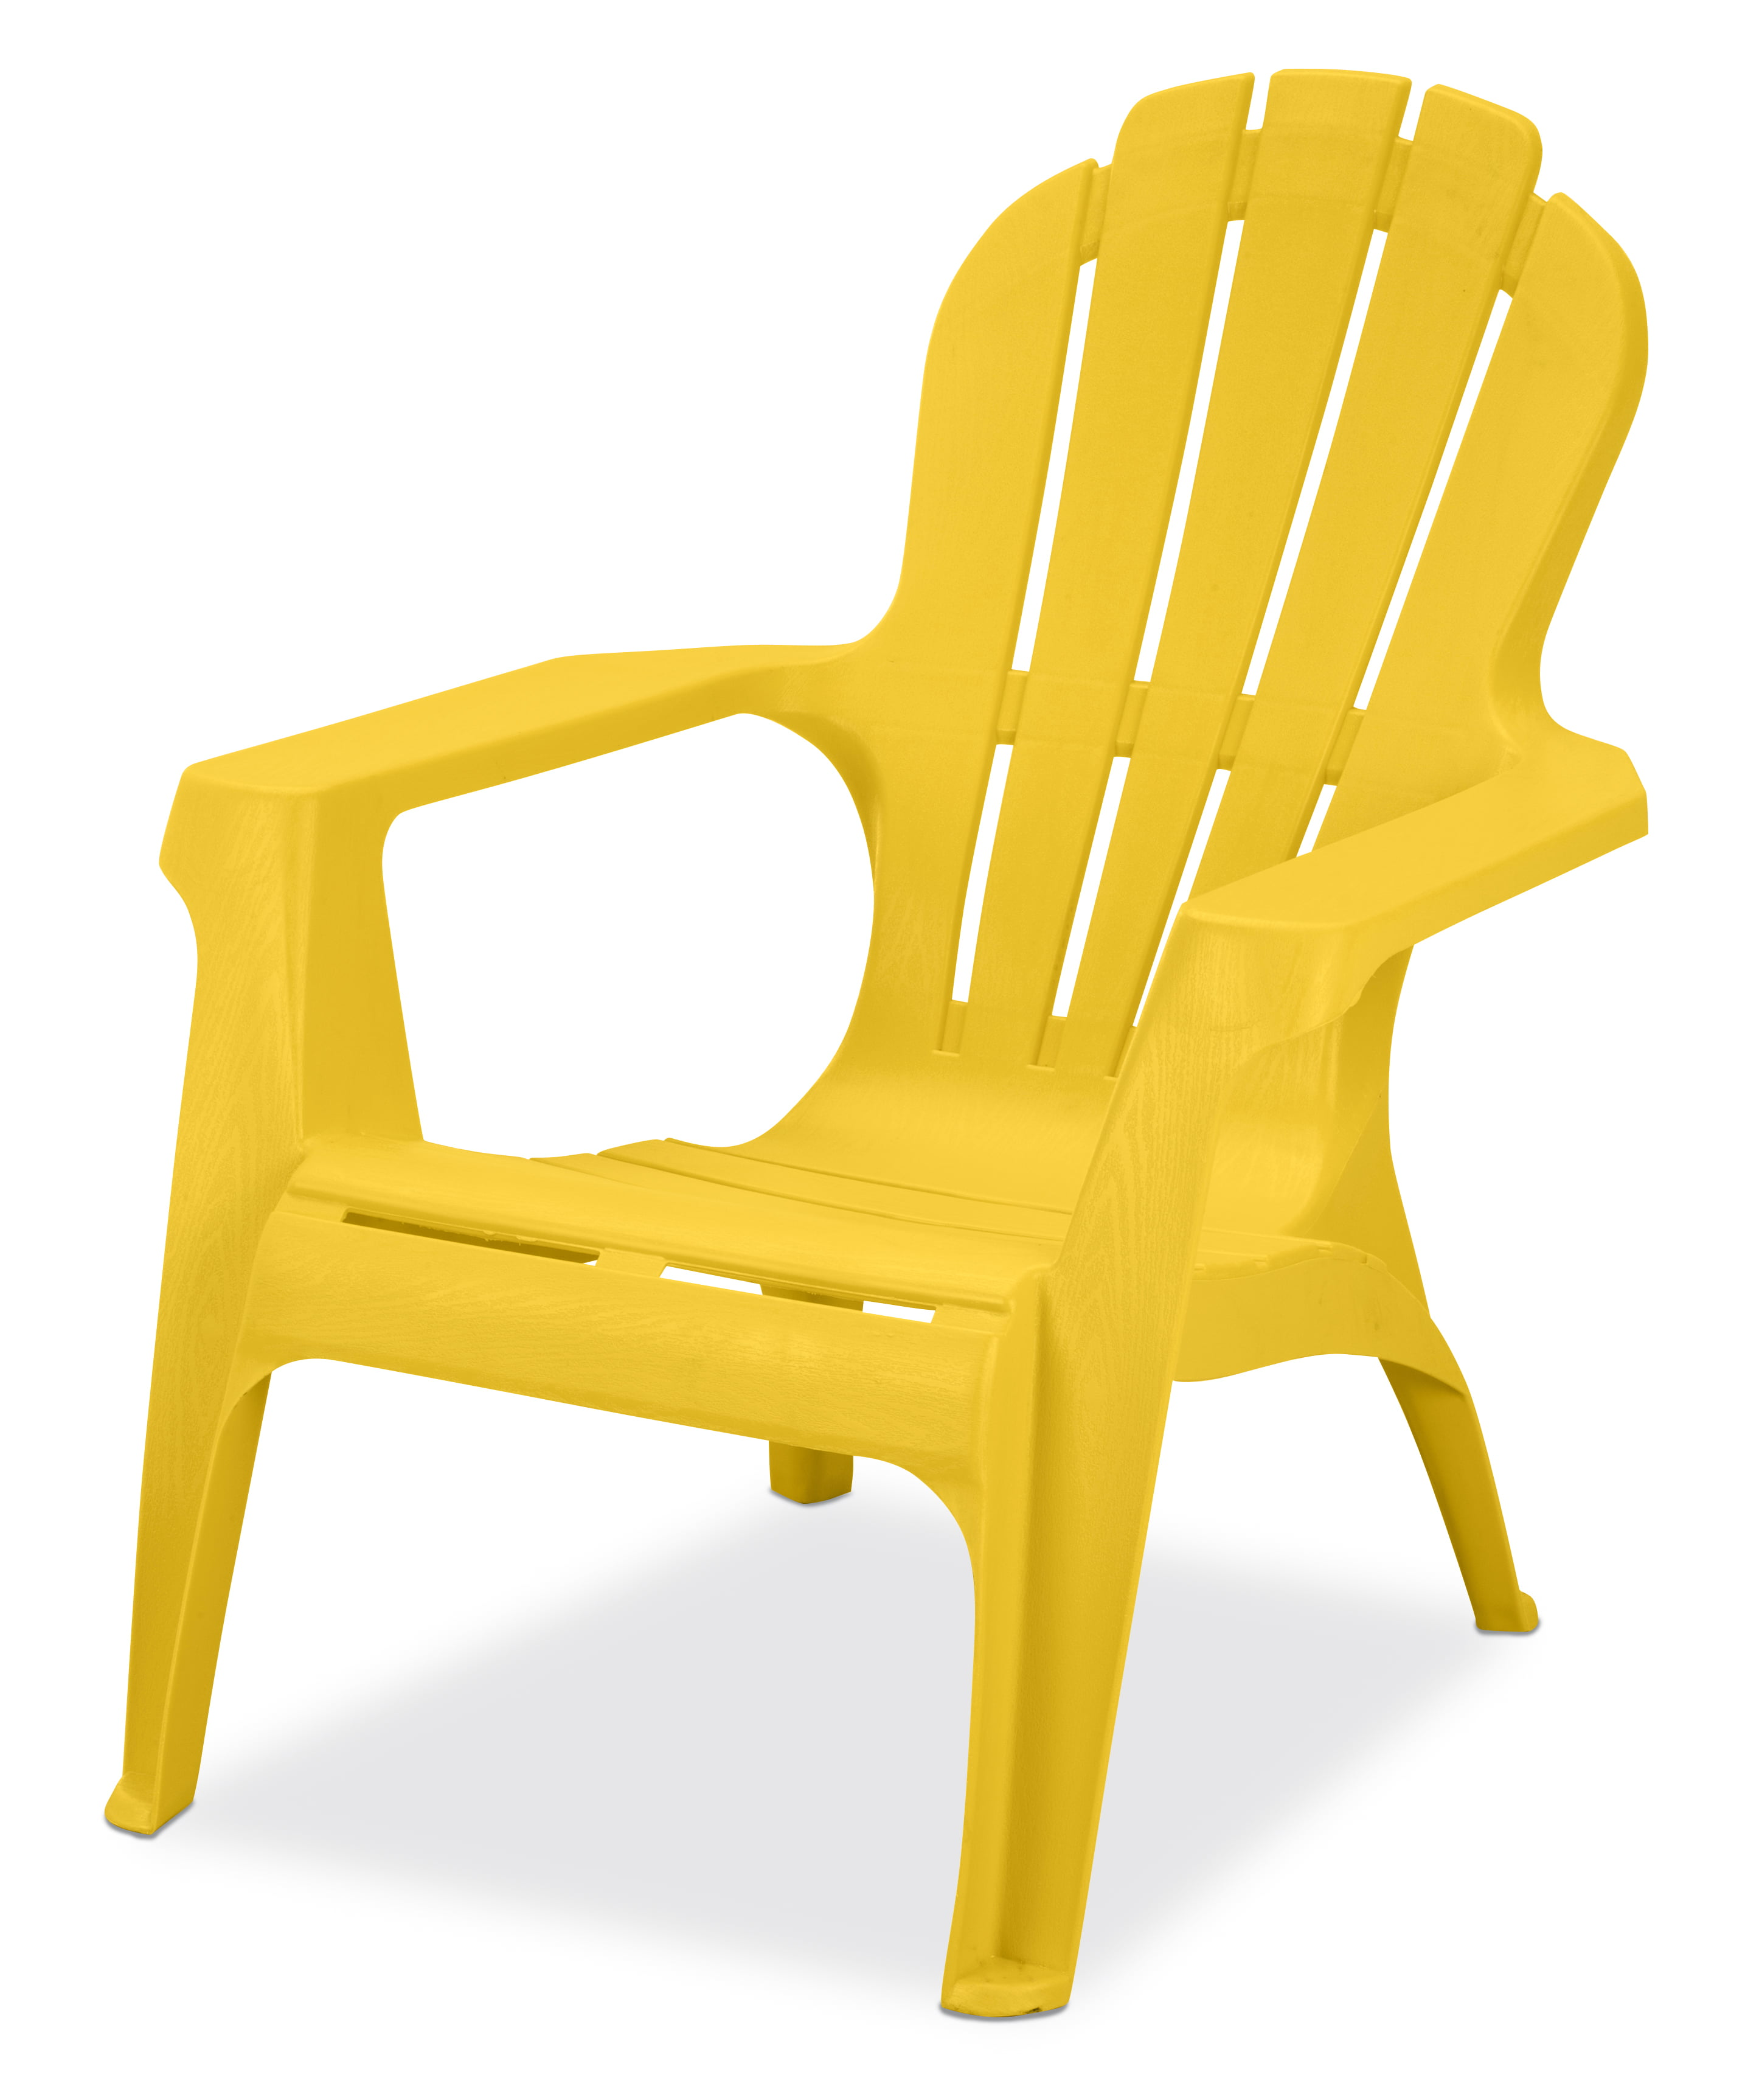 Us Leisure Resin Adirondack Chair Plastic Patio Furniture Yellow